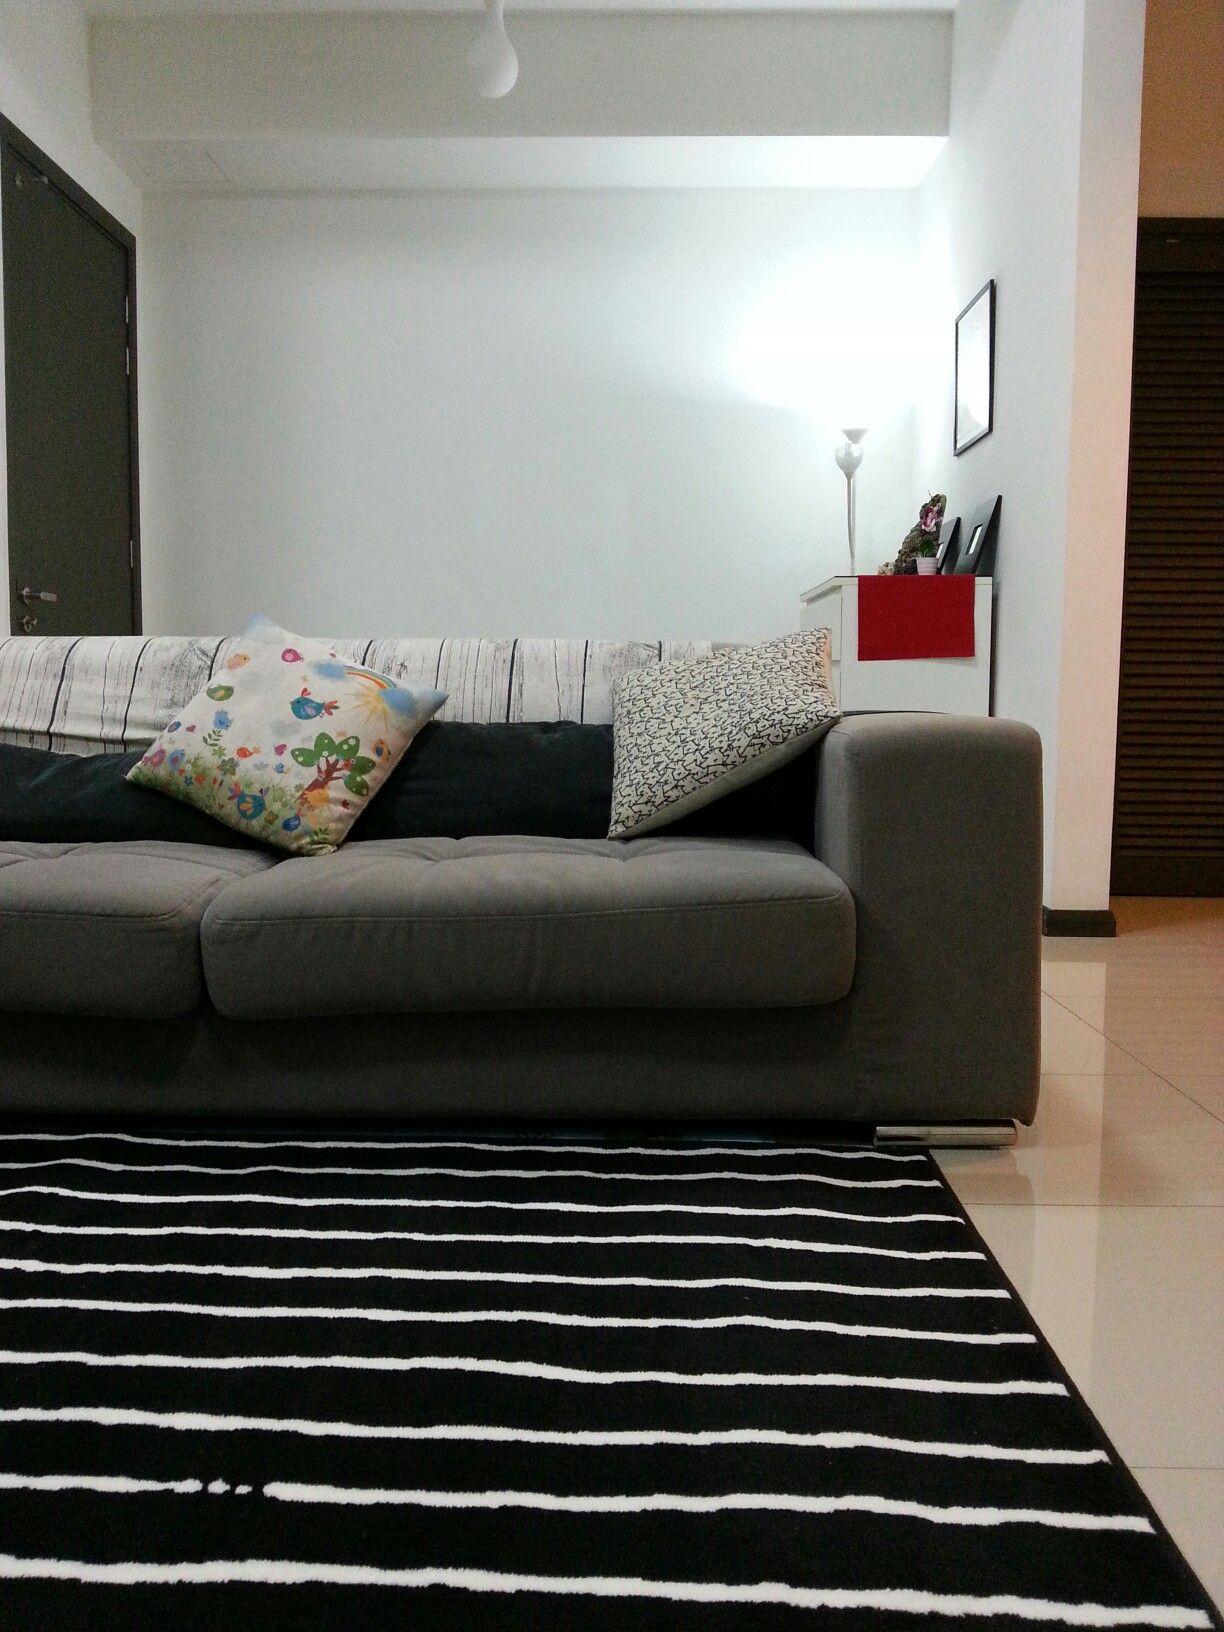 Gorlose Ikea Carpet In Living Room Kantoor